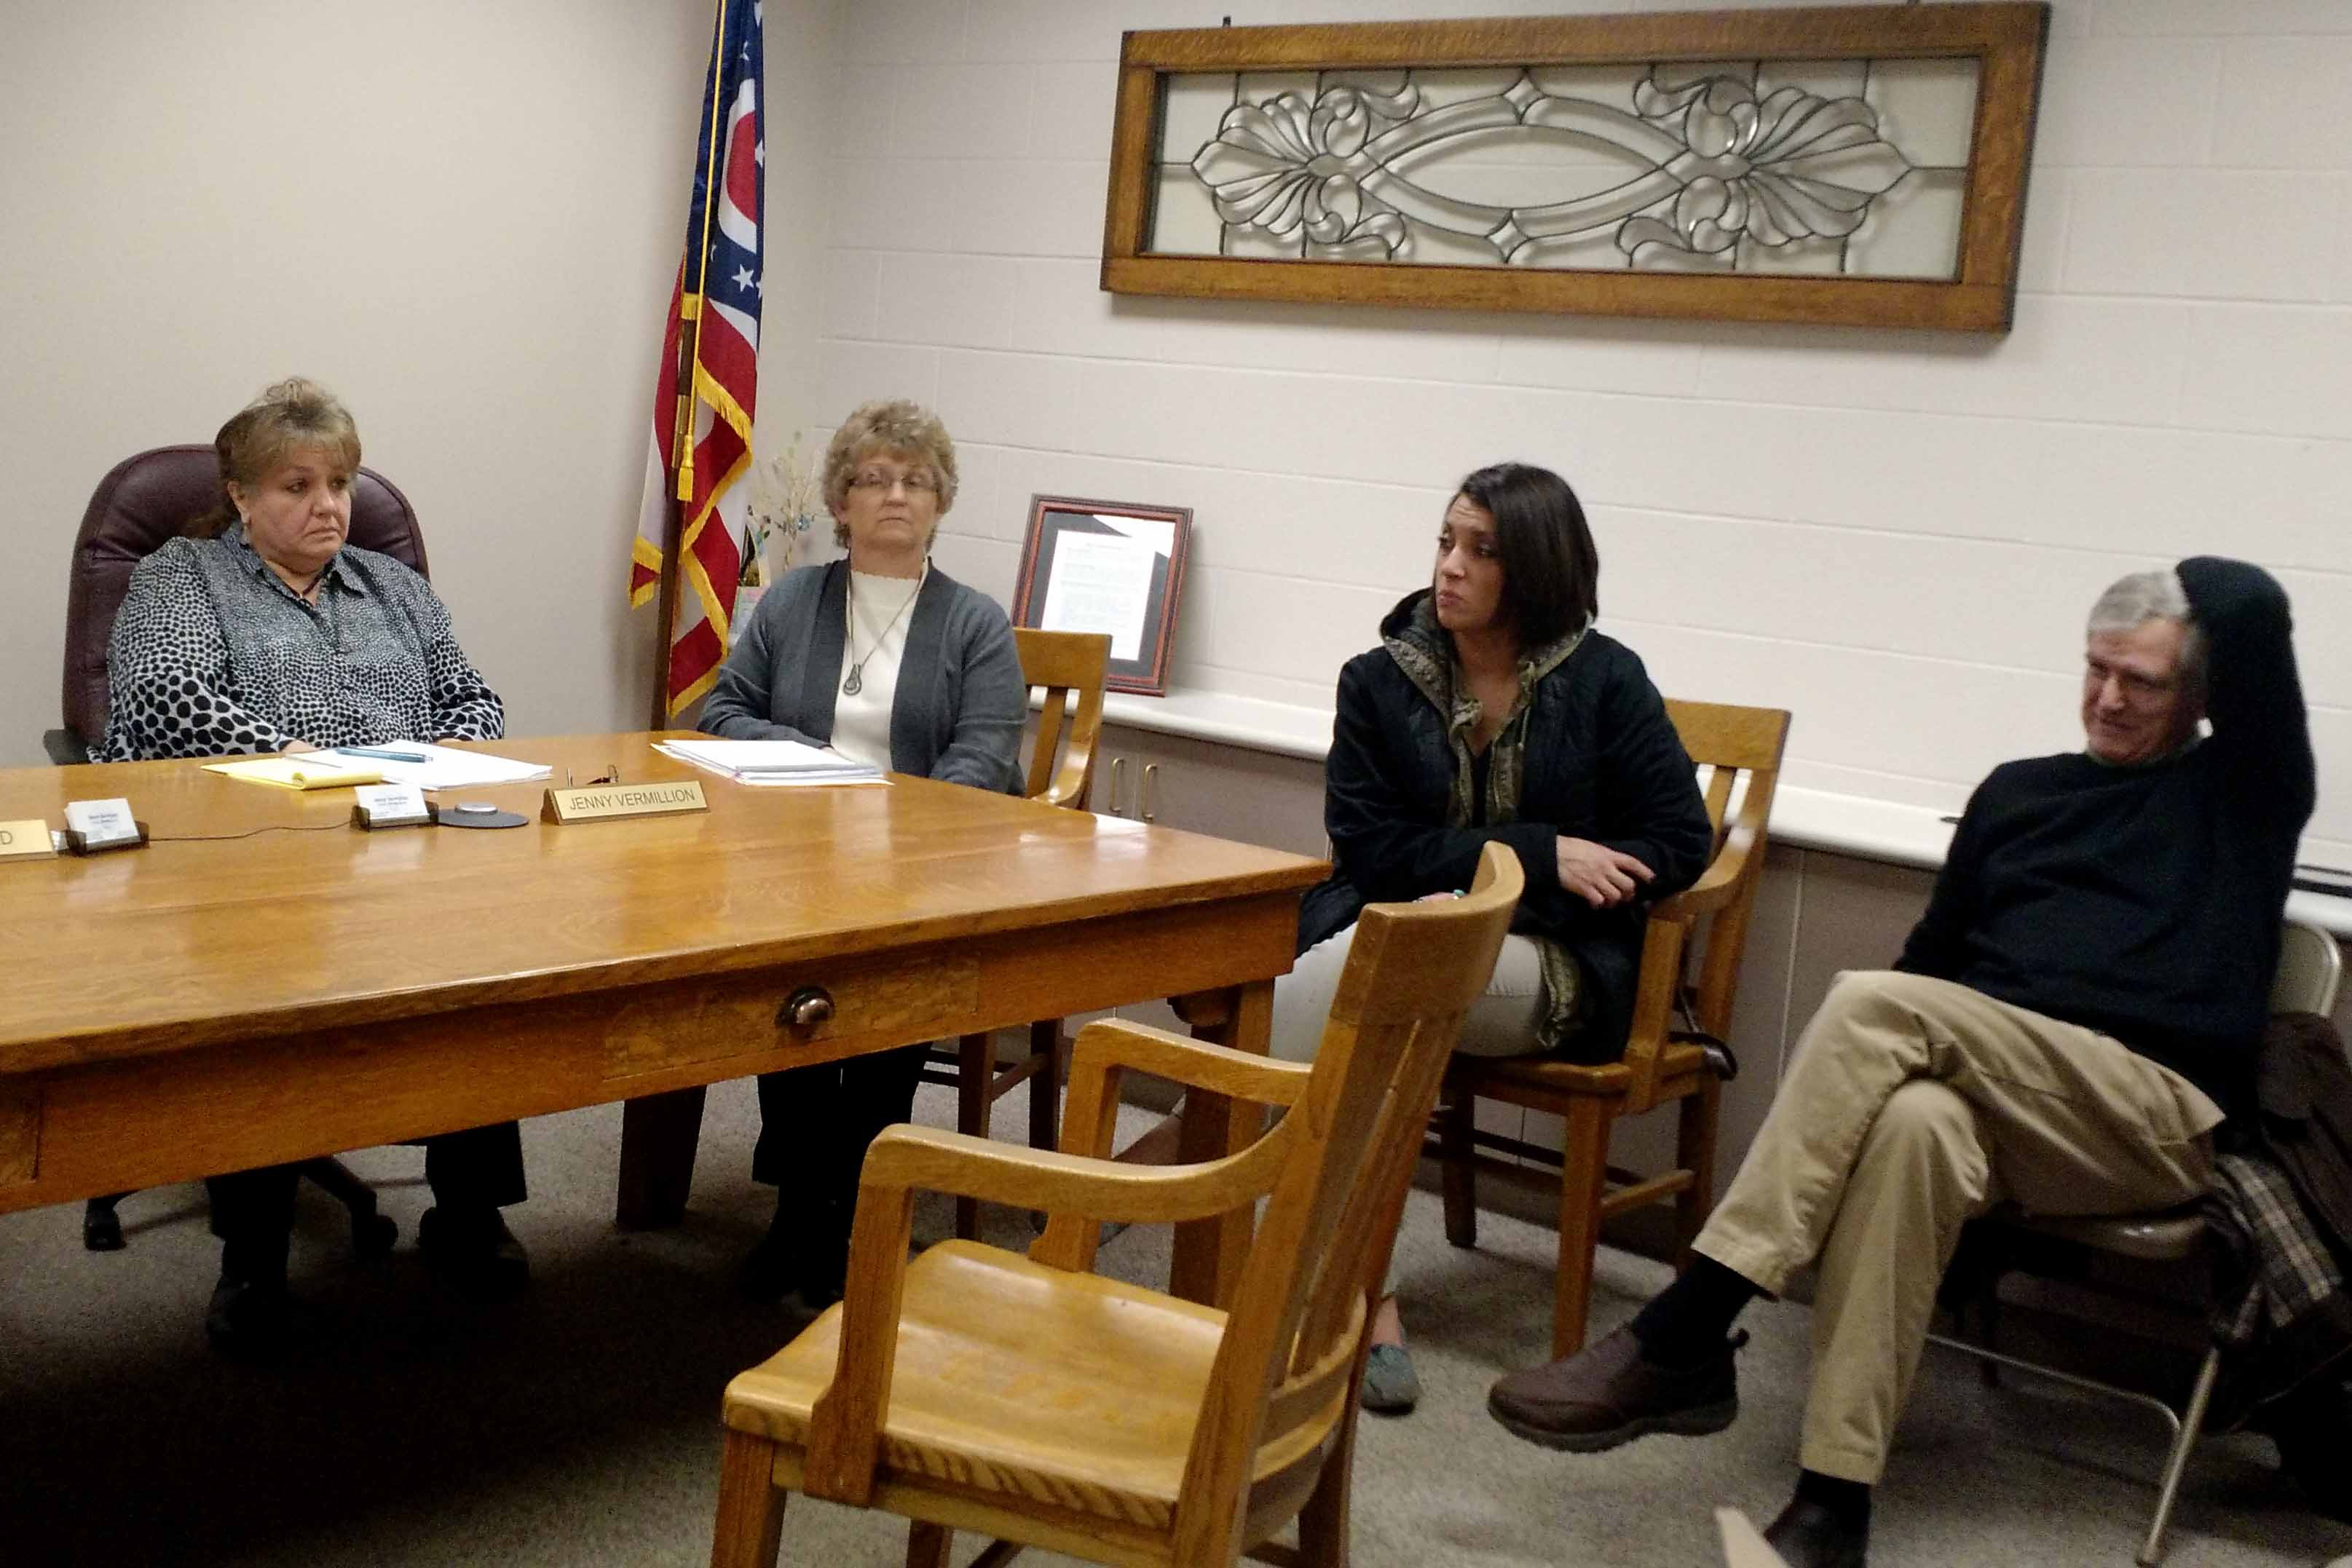 Officials discuss county wide tourism bureau with for Bureau local